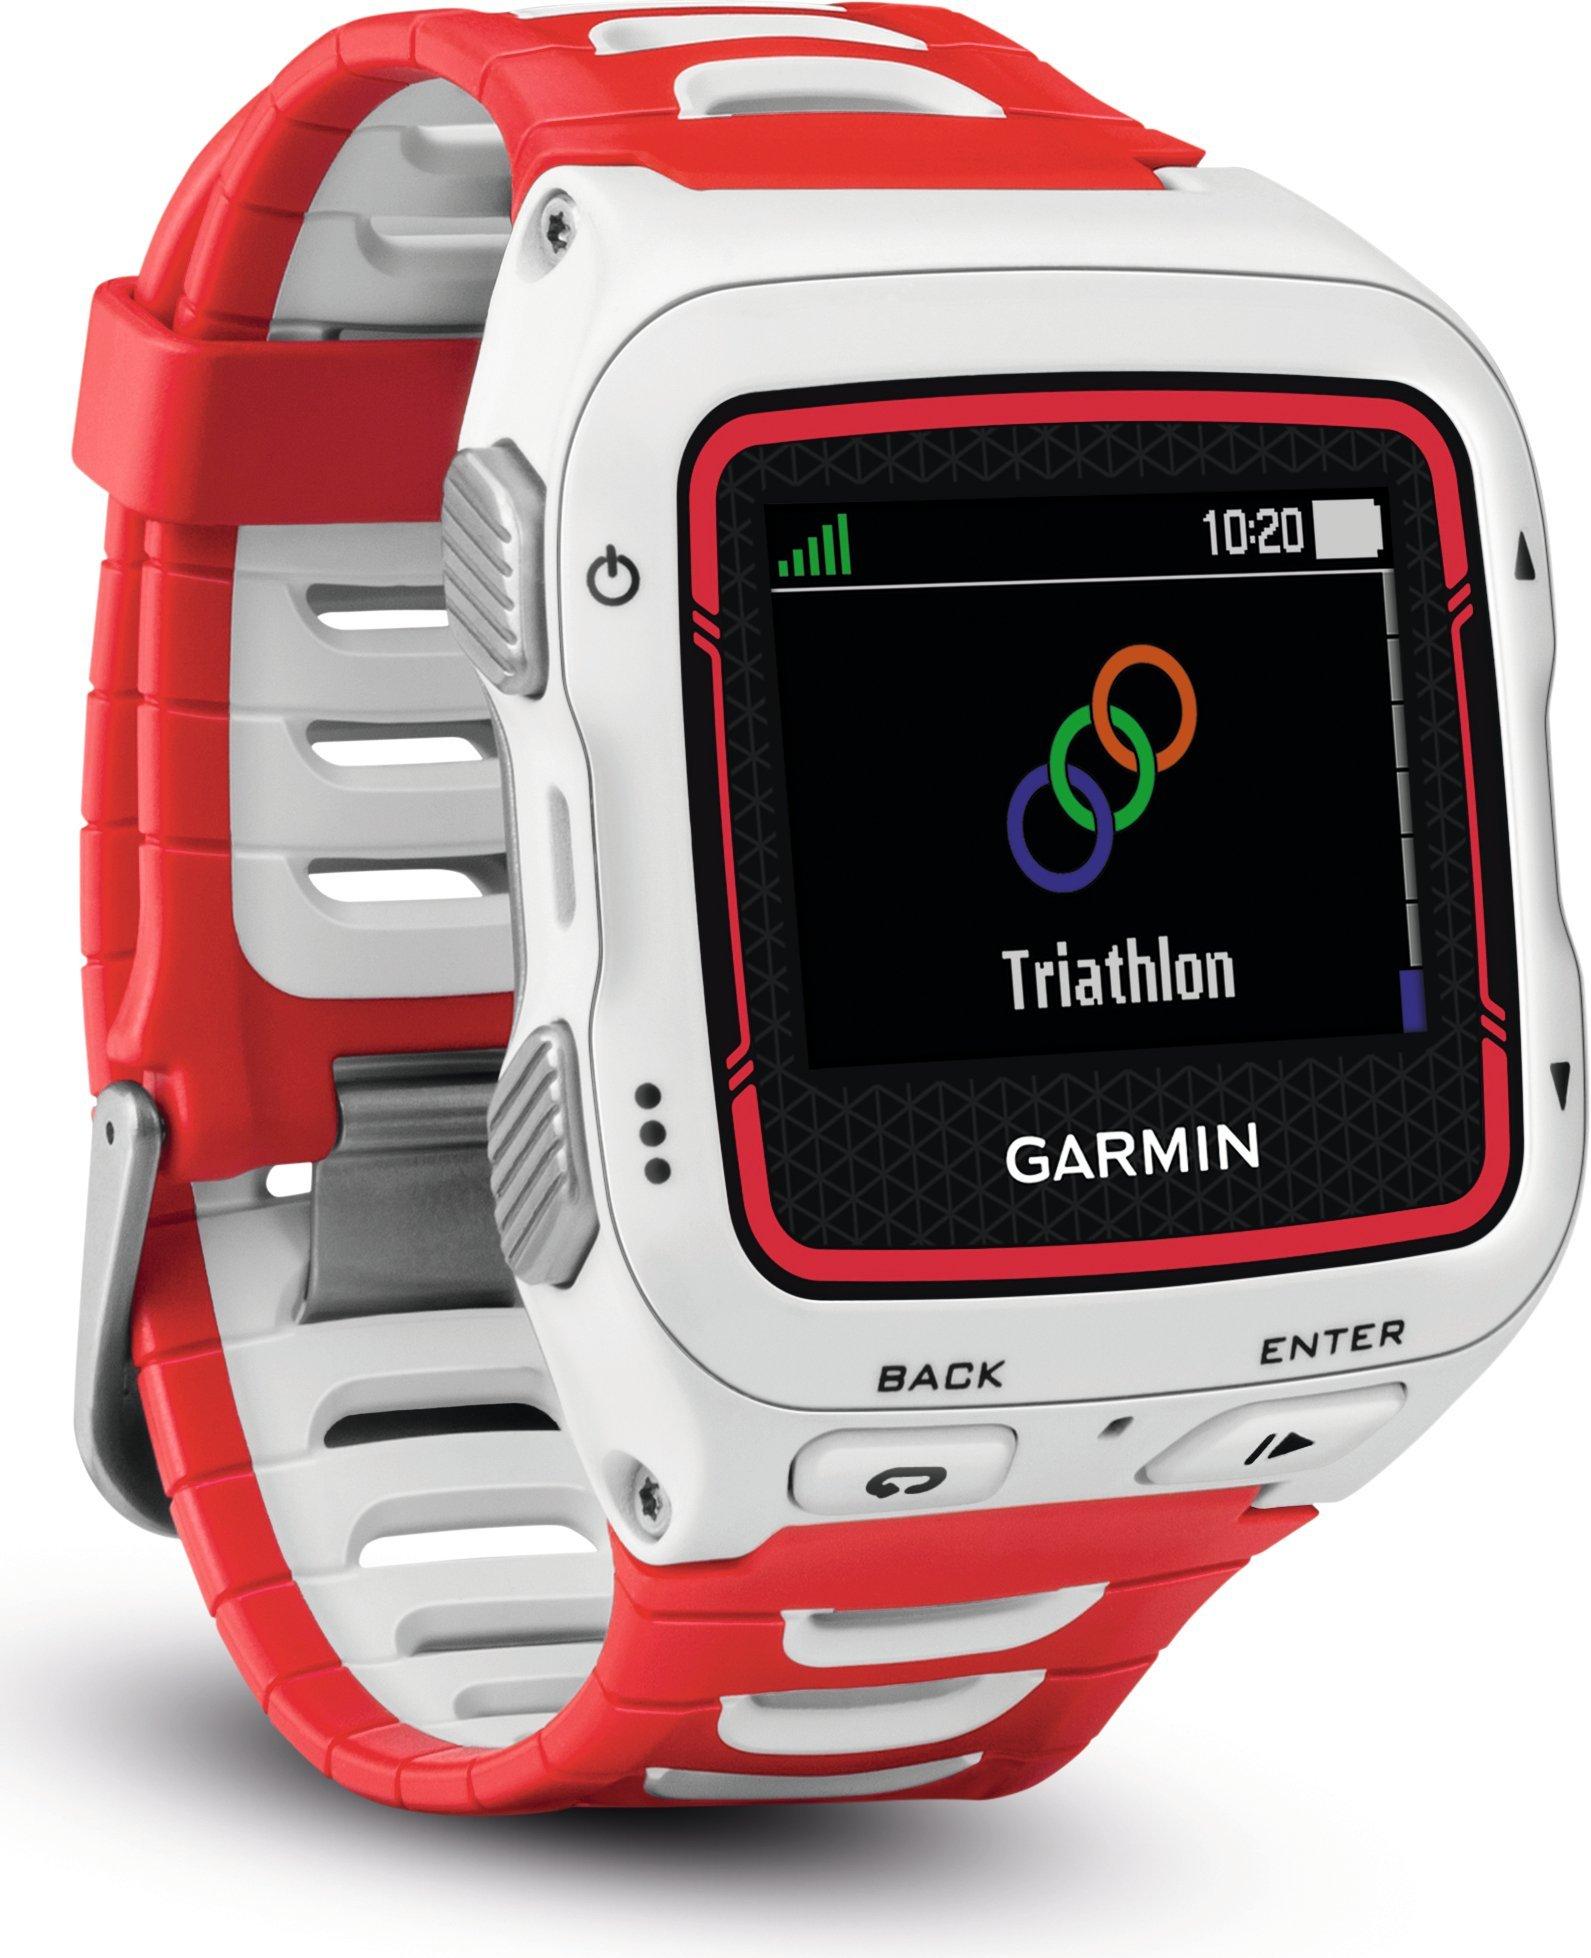 Garmin - Forerunner 920XT - Montre GPS Multisports - Blanche et Rouge product image